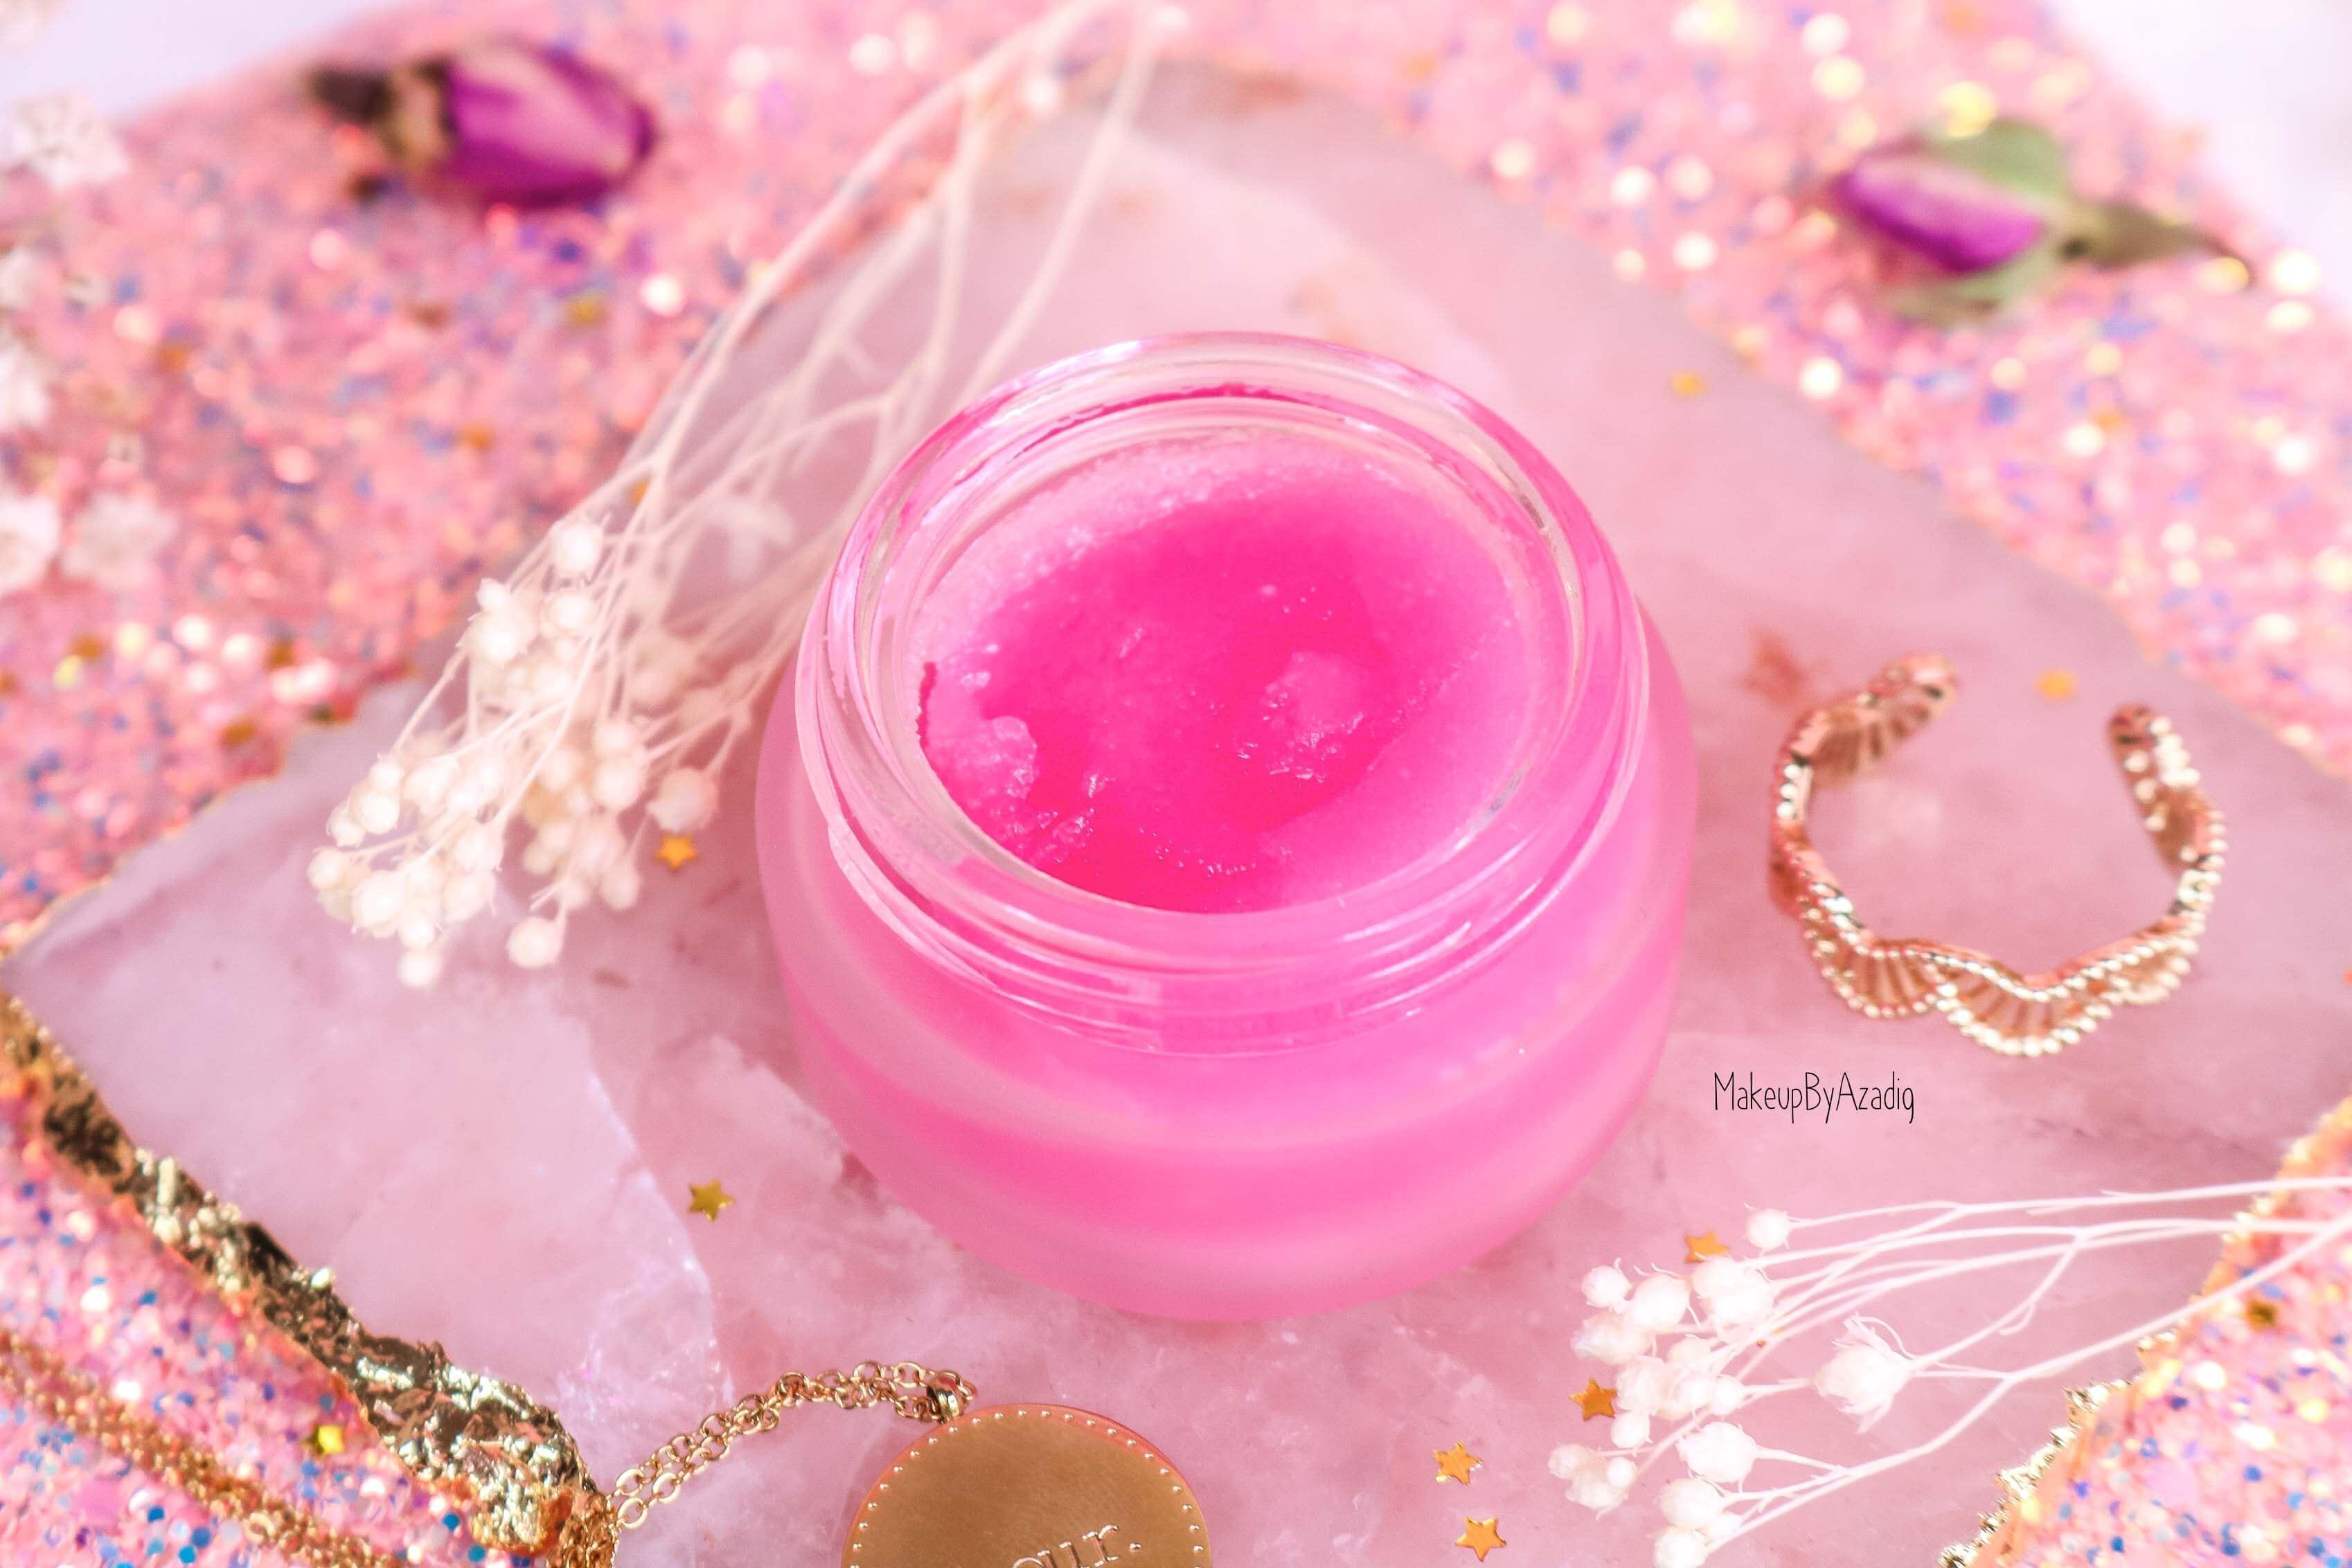 revue-baume-gommage-levres-coco-kiss-hellobody-avis-prix-swatch-makeupbyazadig-efficacite-lip-scrub-zoom